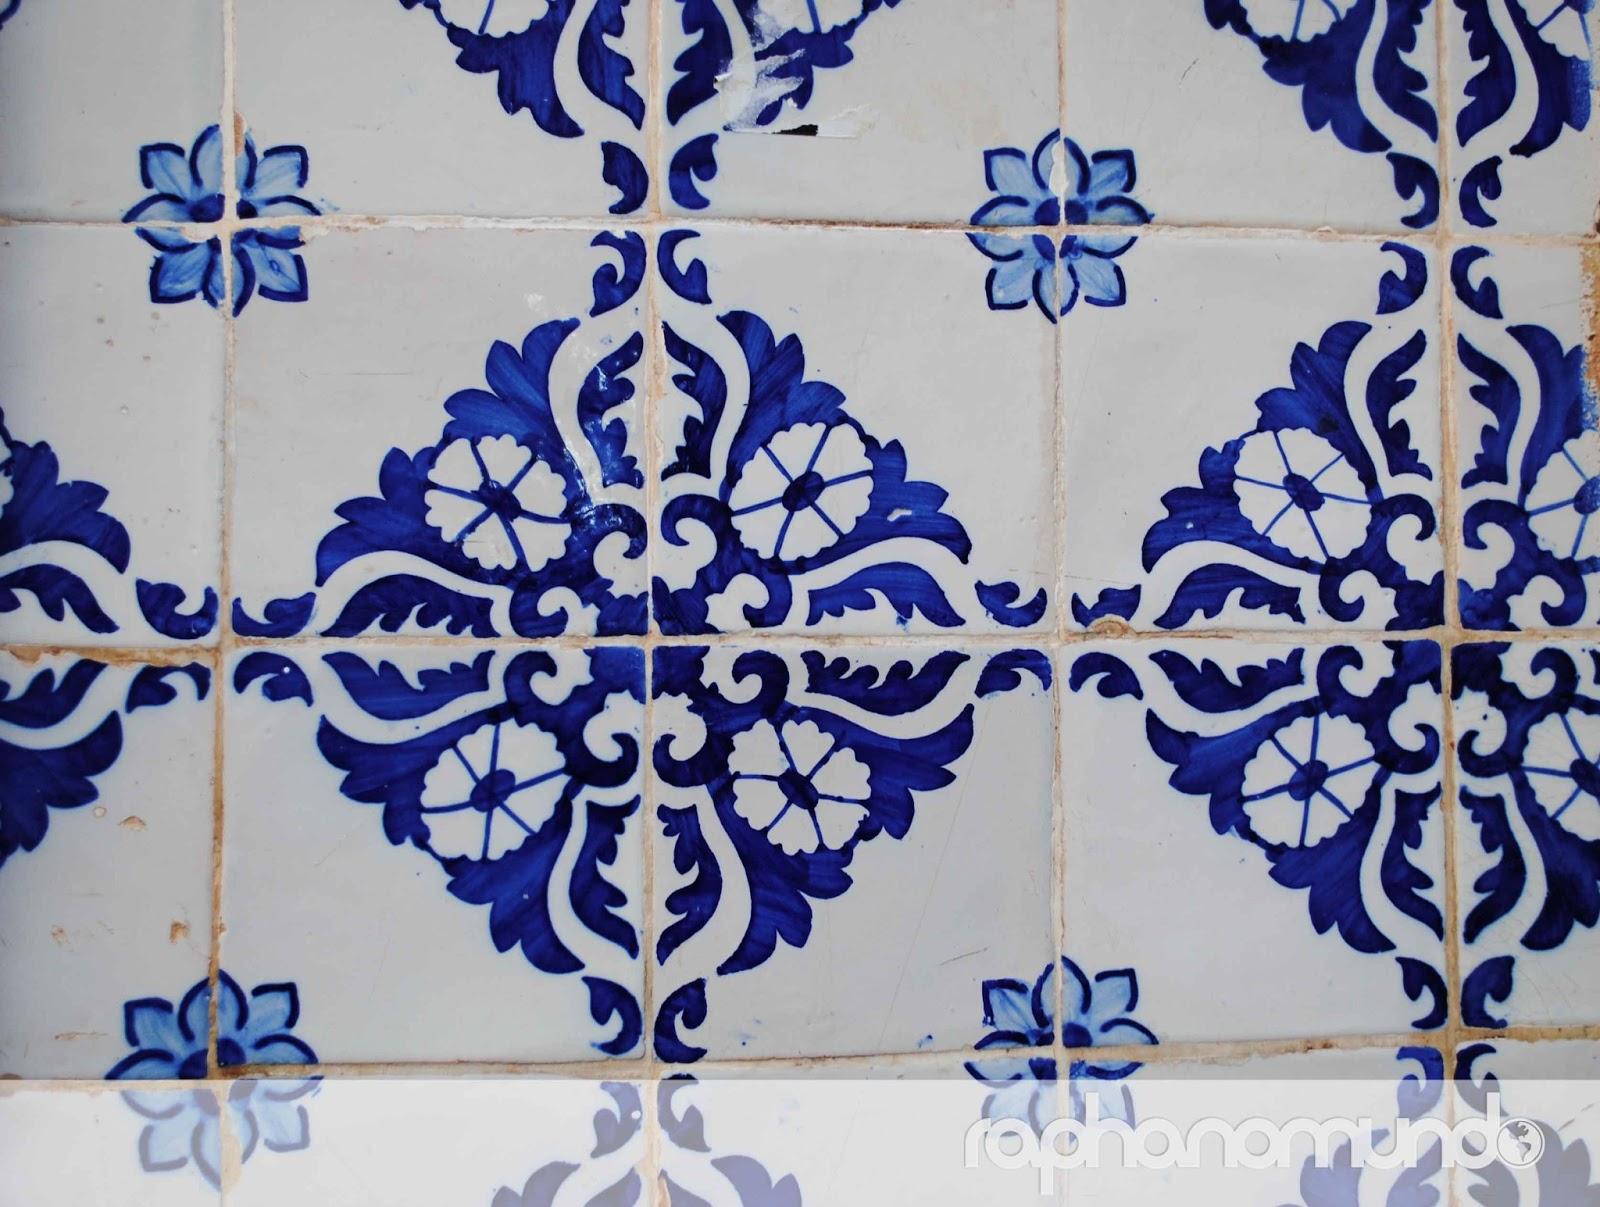 S o lu s centro hist rico raphanomundo blog de viagem for Casa de los azulejos centro historico